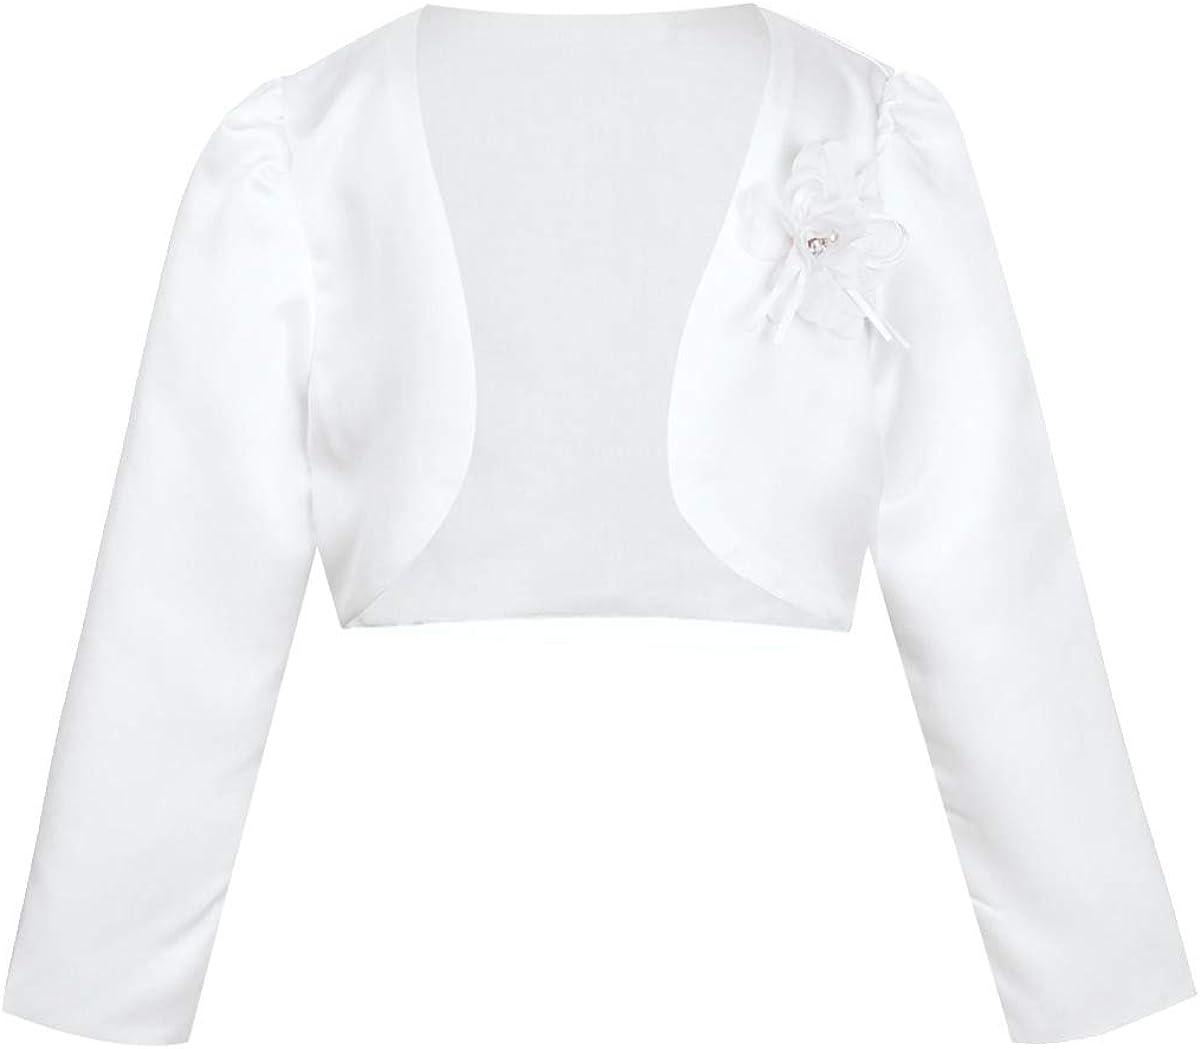 JanJean Kids Girl's Long Sleeve Bolero Jacket Shrug Short Cardigan Dress Cover up Outerwear